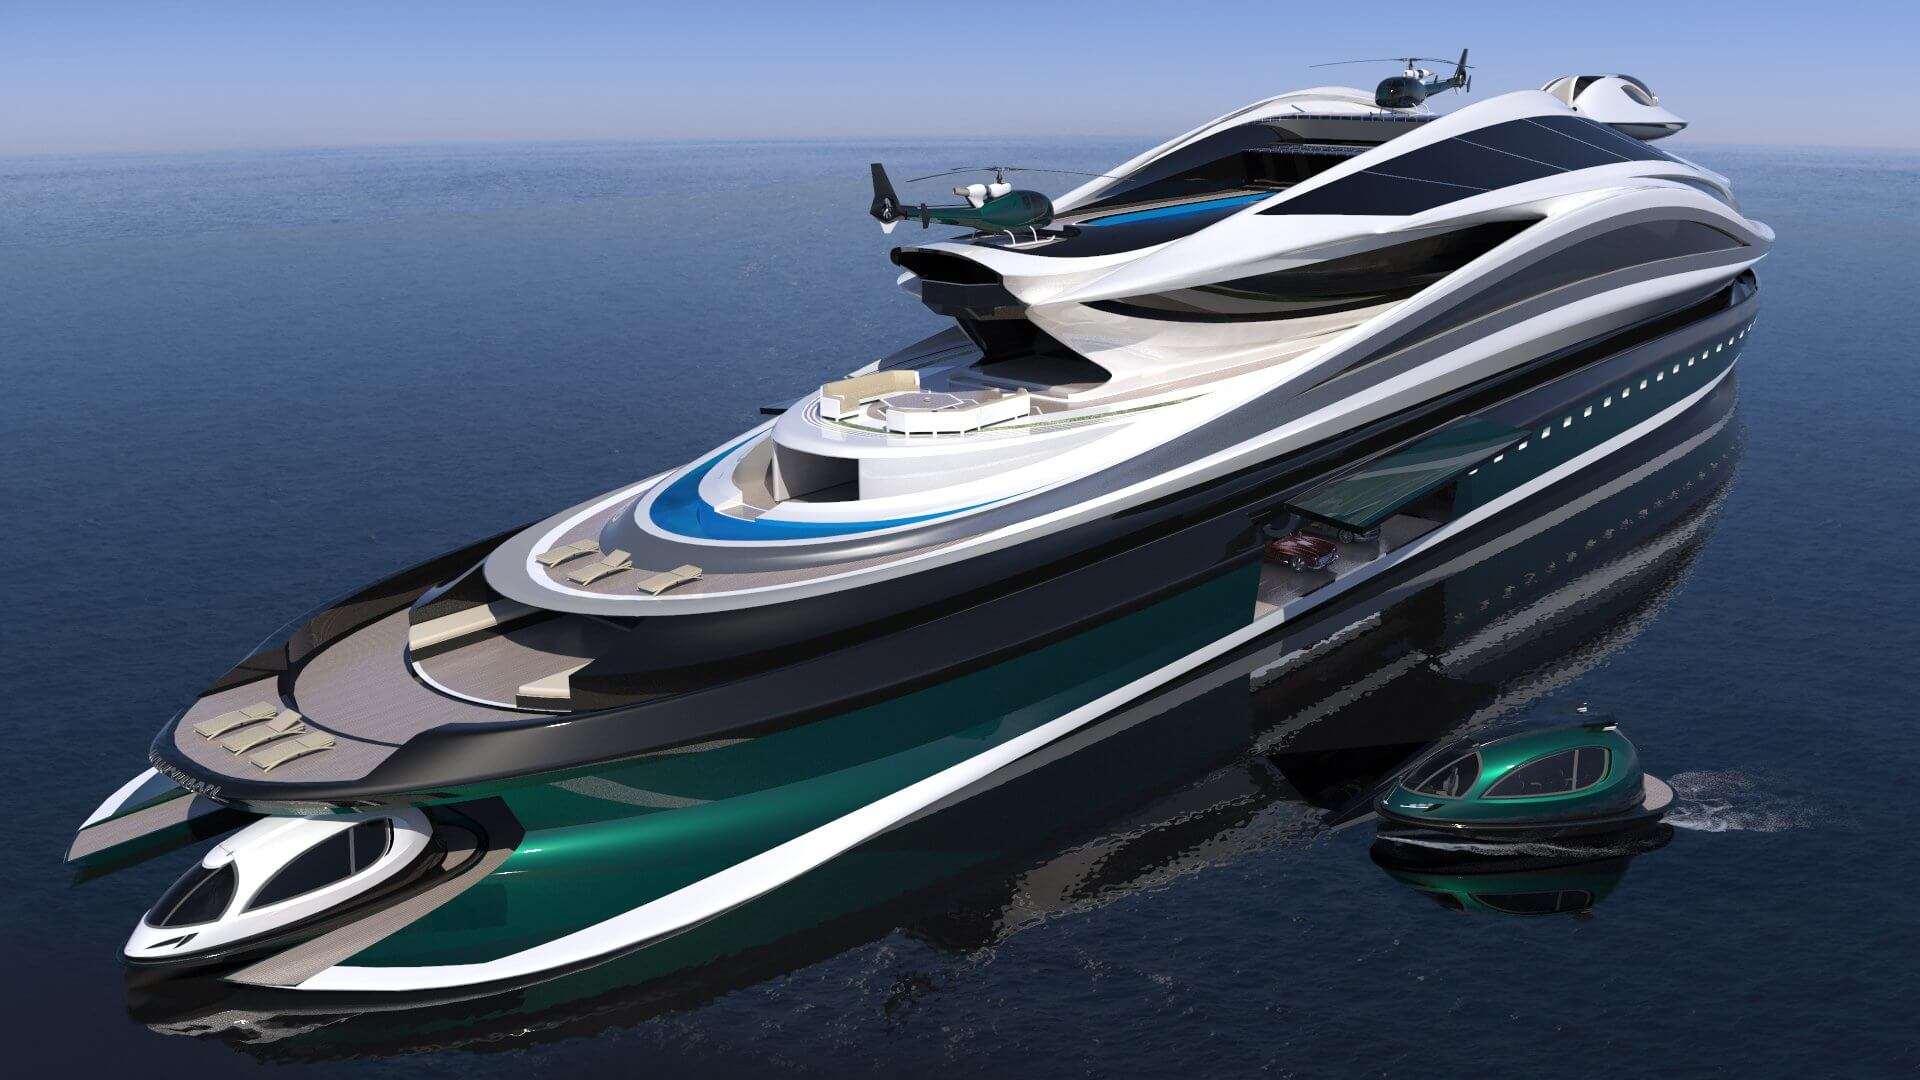 Superyacht Concept Avanguardia The Swan by Lazzarini Studio Design Jet Capsule Tender